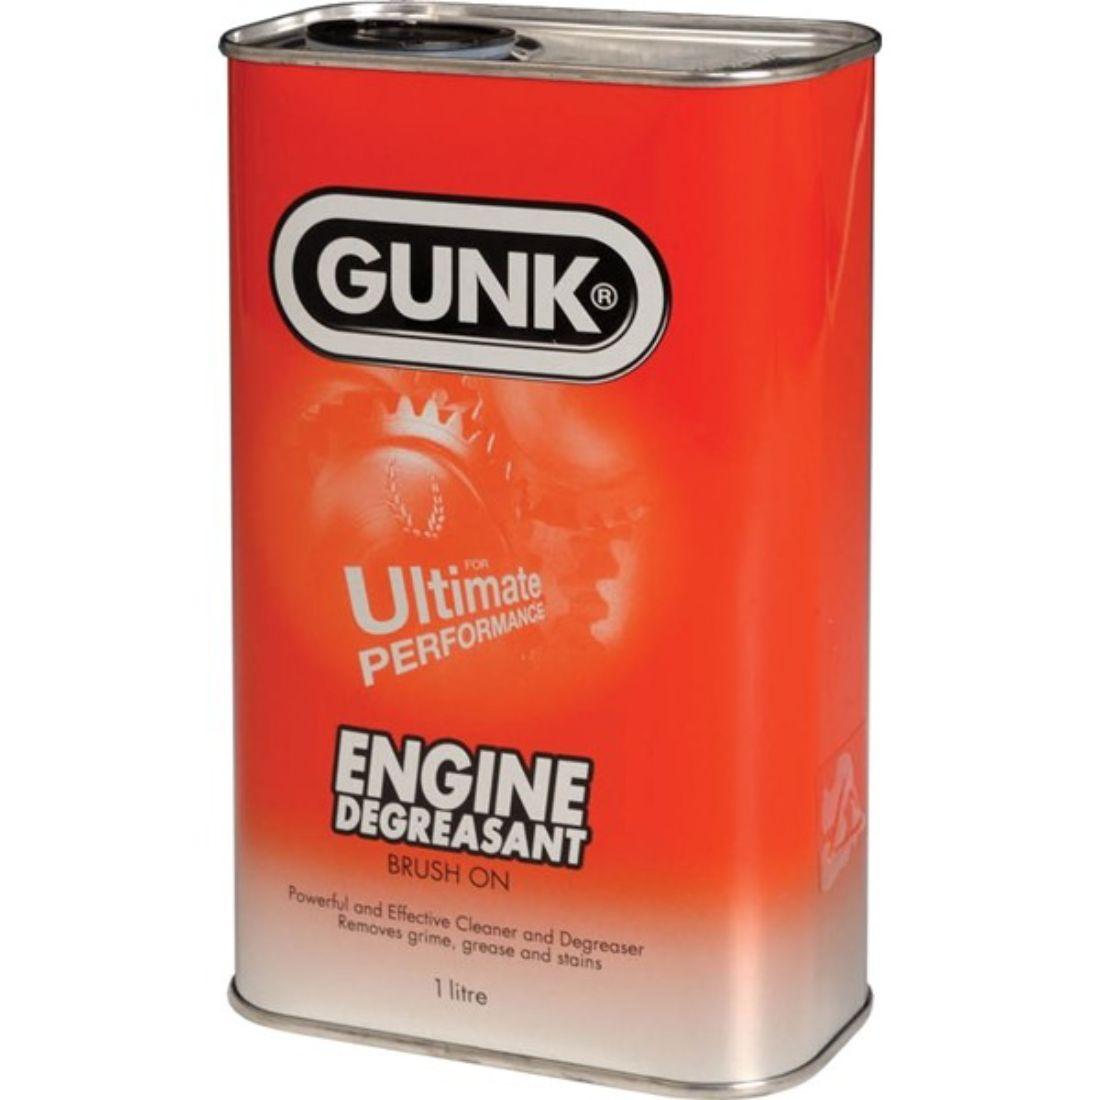 Gunk Ultra Degreaser Engine Oil Remover Cleaner Car Van Gunk 7331L 1 Litre